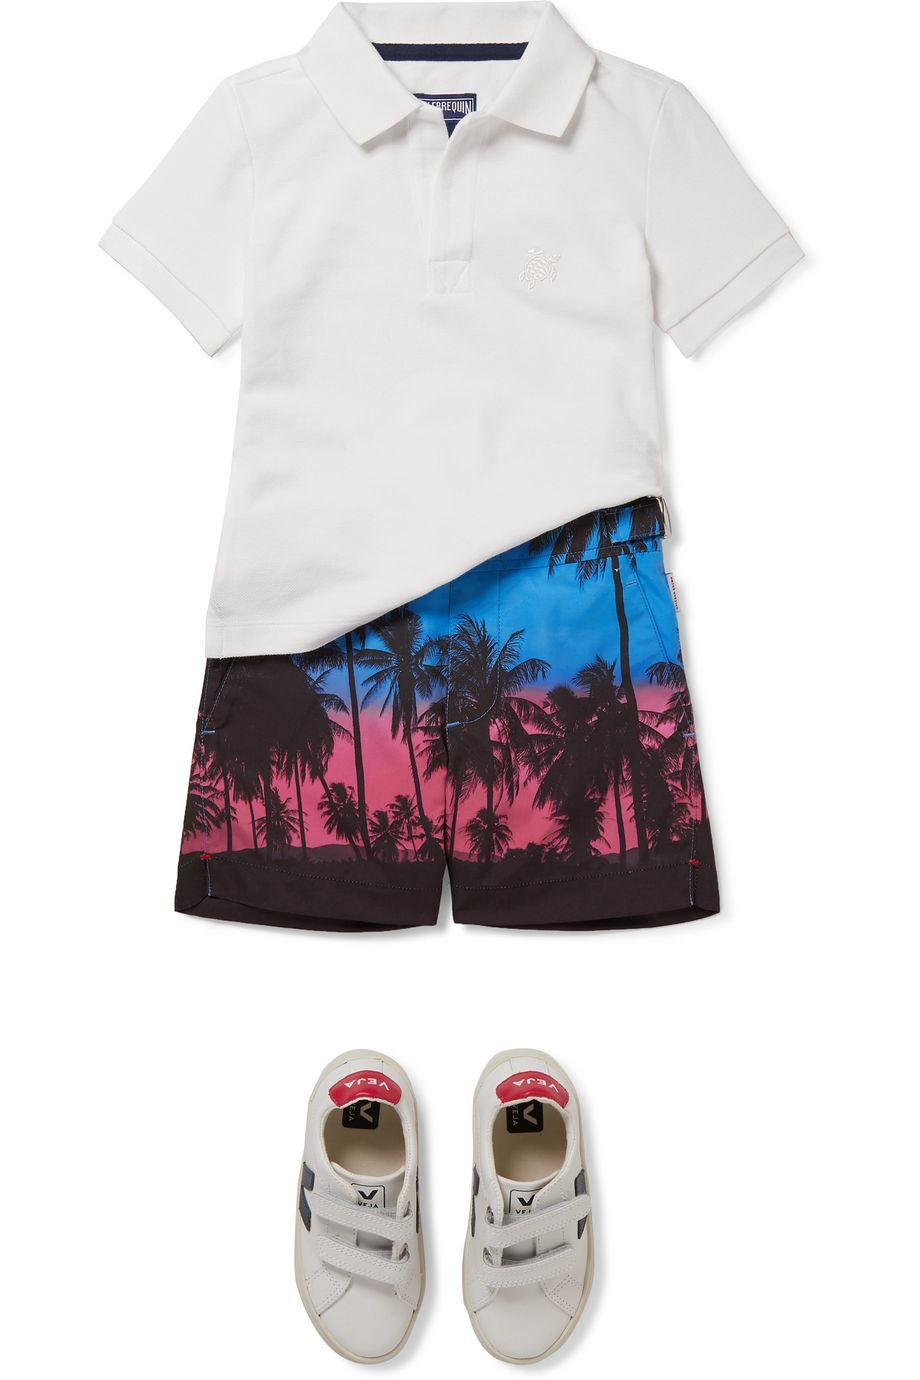 Orlebar Brown Kids Russell printed swim shorts